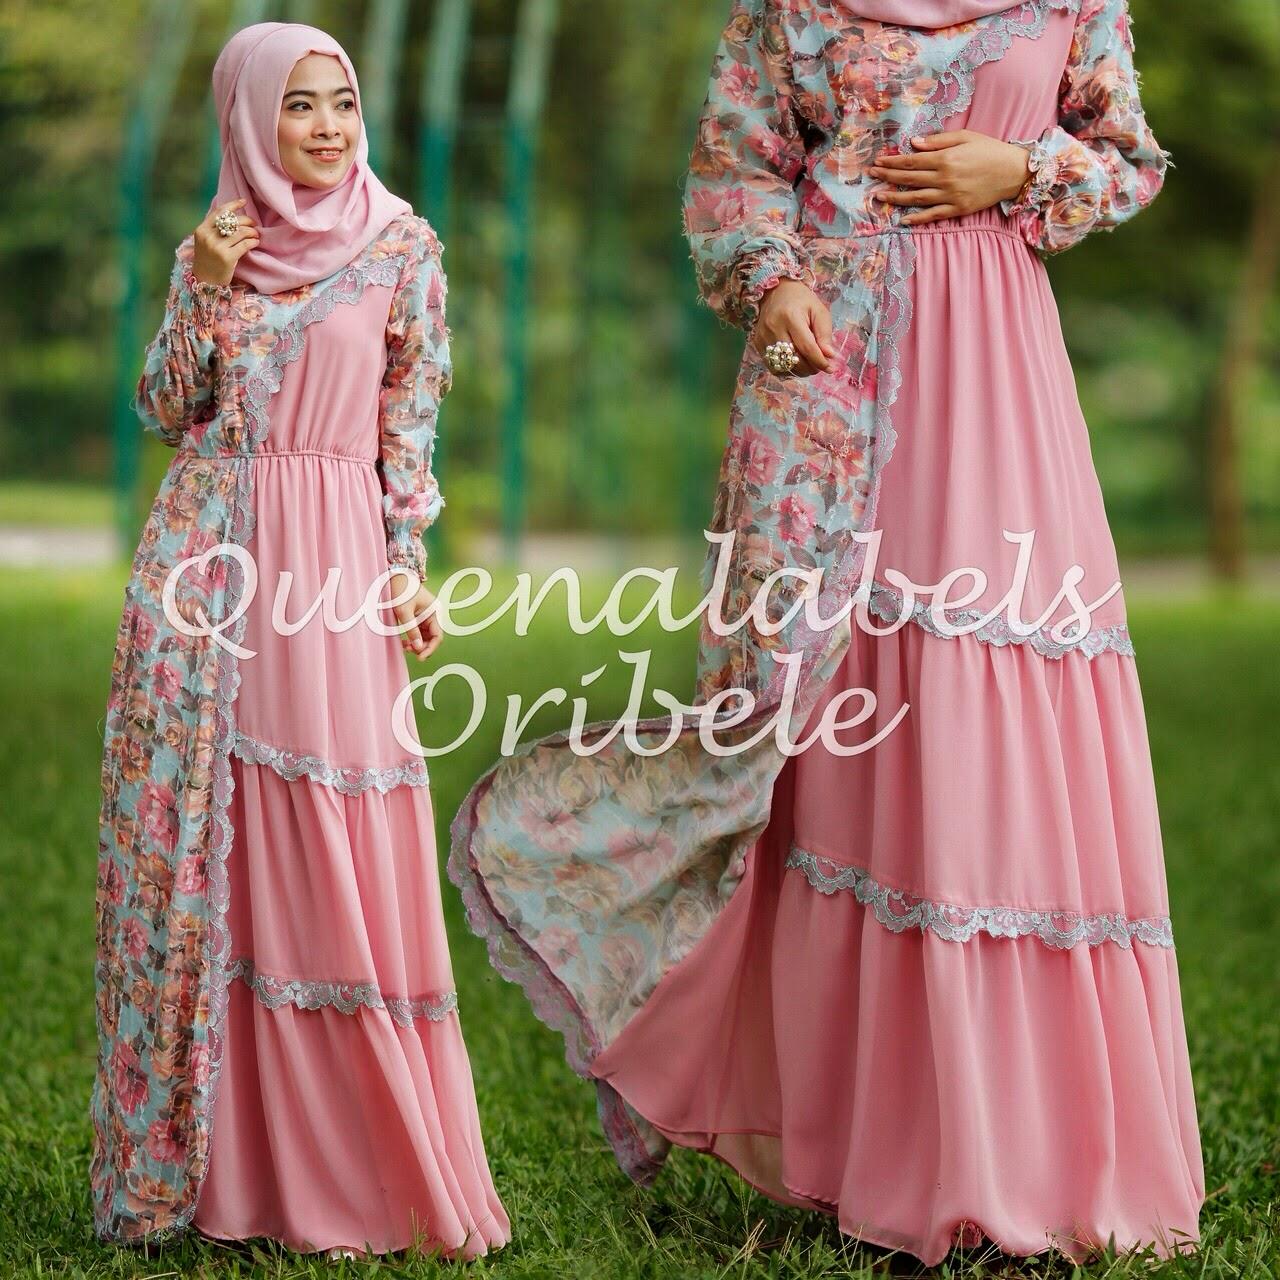 Baju Gamis Terbaru Ala Syahrini Oribele Dress By